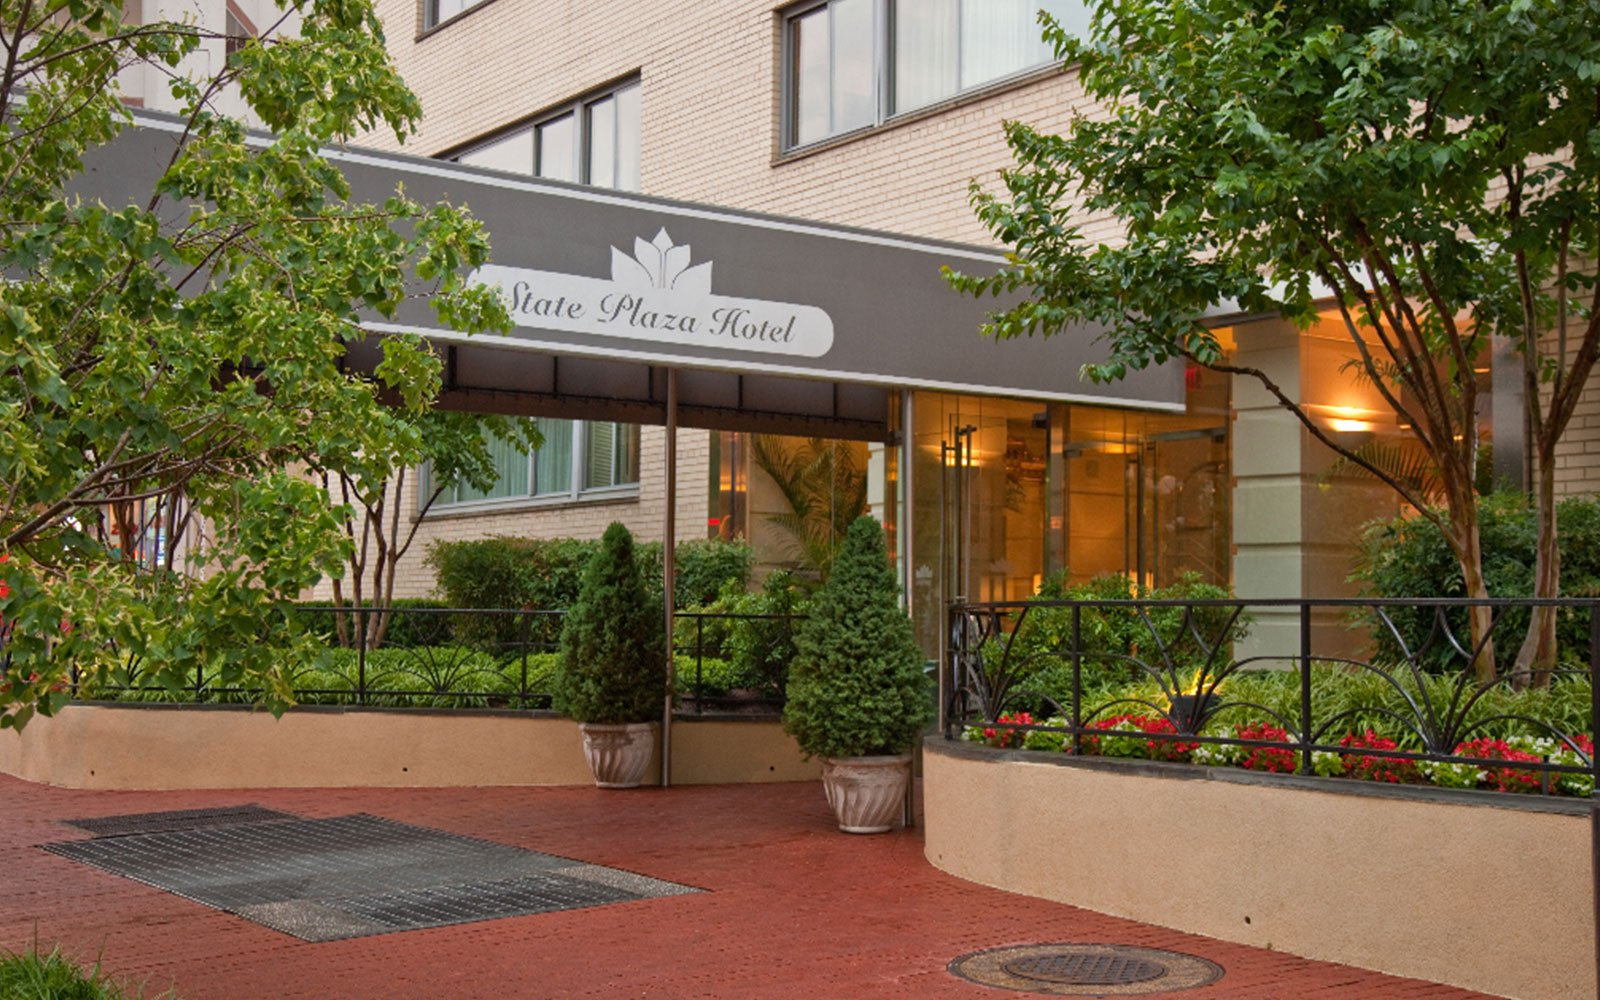 washington d c hotel in foggy bottom state plaza hotel. Black Bedroom Furniture Sets. Home Design Ideas